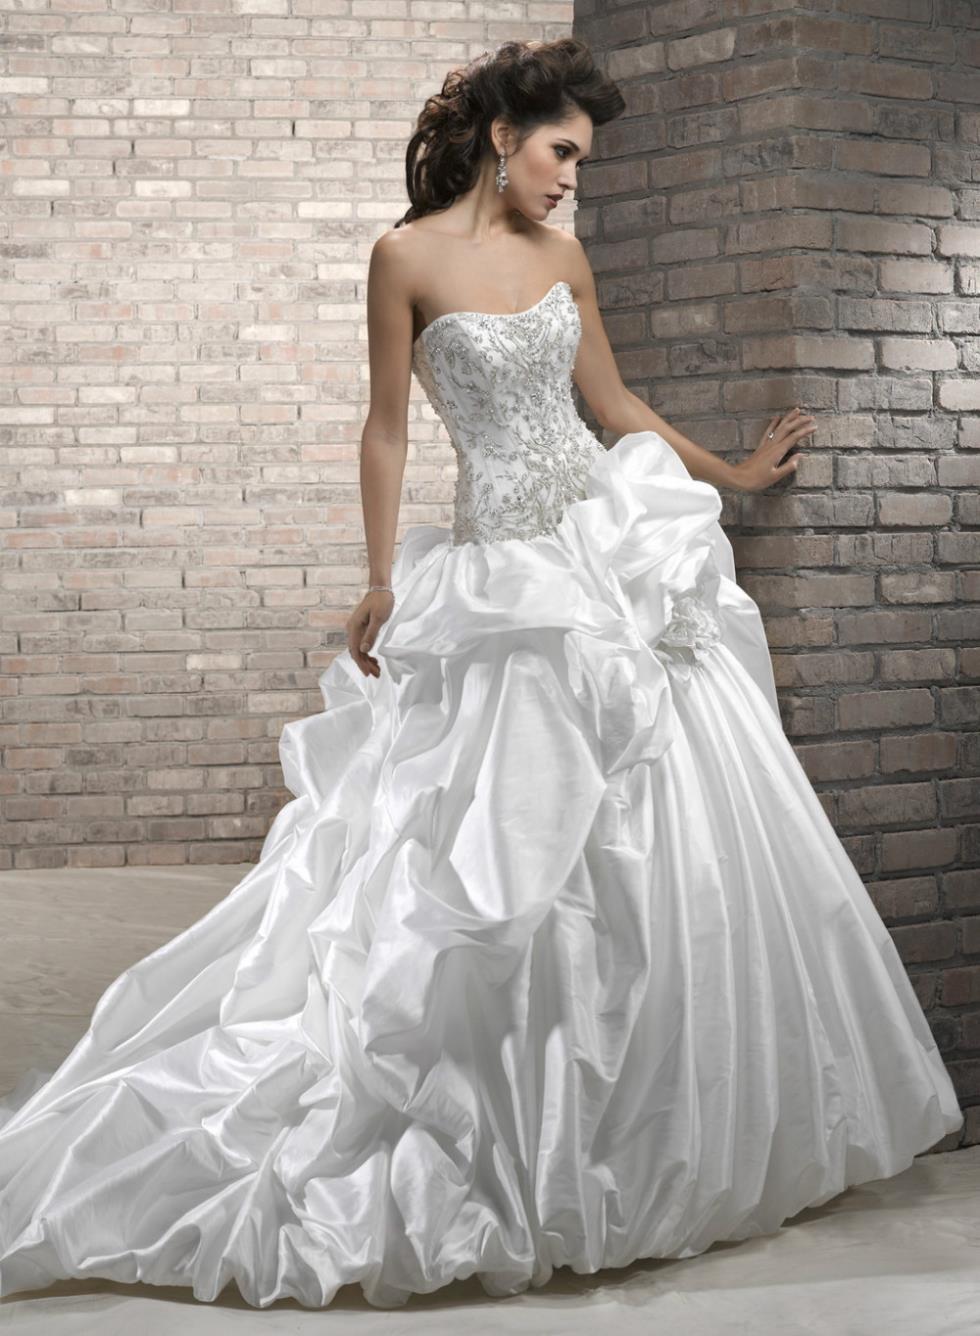 free shipping 2016 diamond waist dress handmade Bridal wedding gowns ever pretty plus size dresses vintage wedding dress